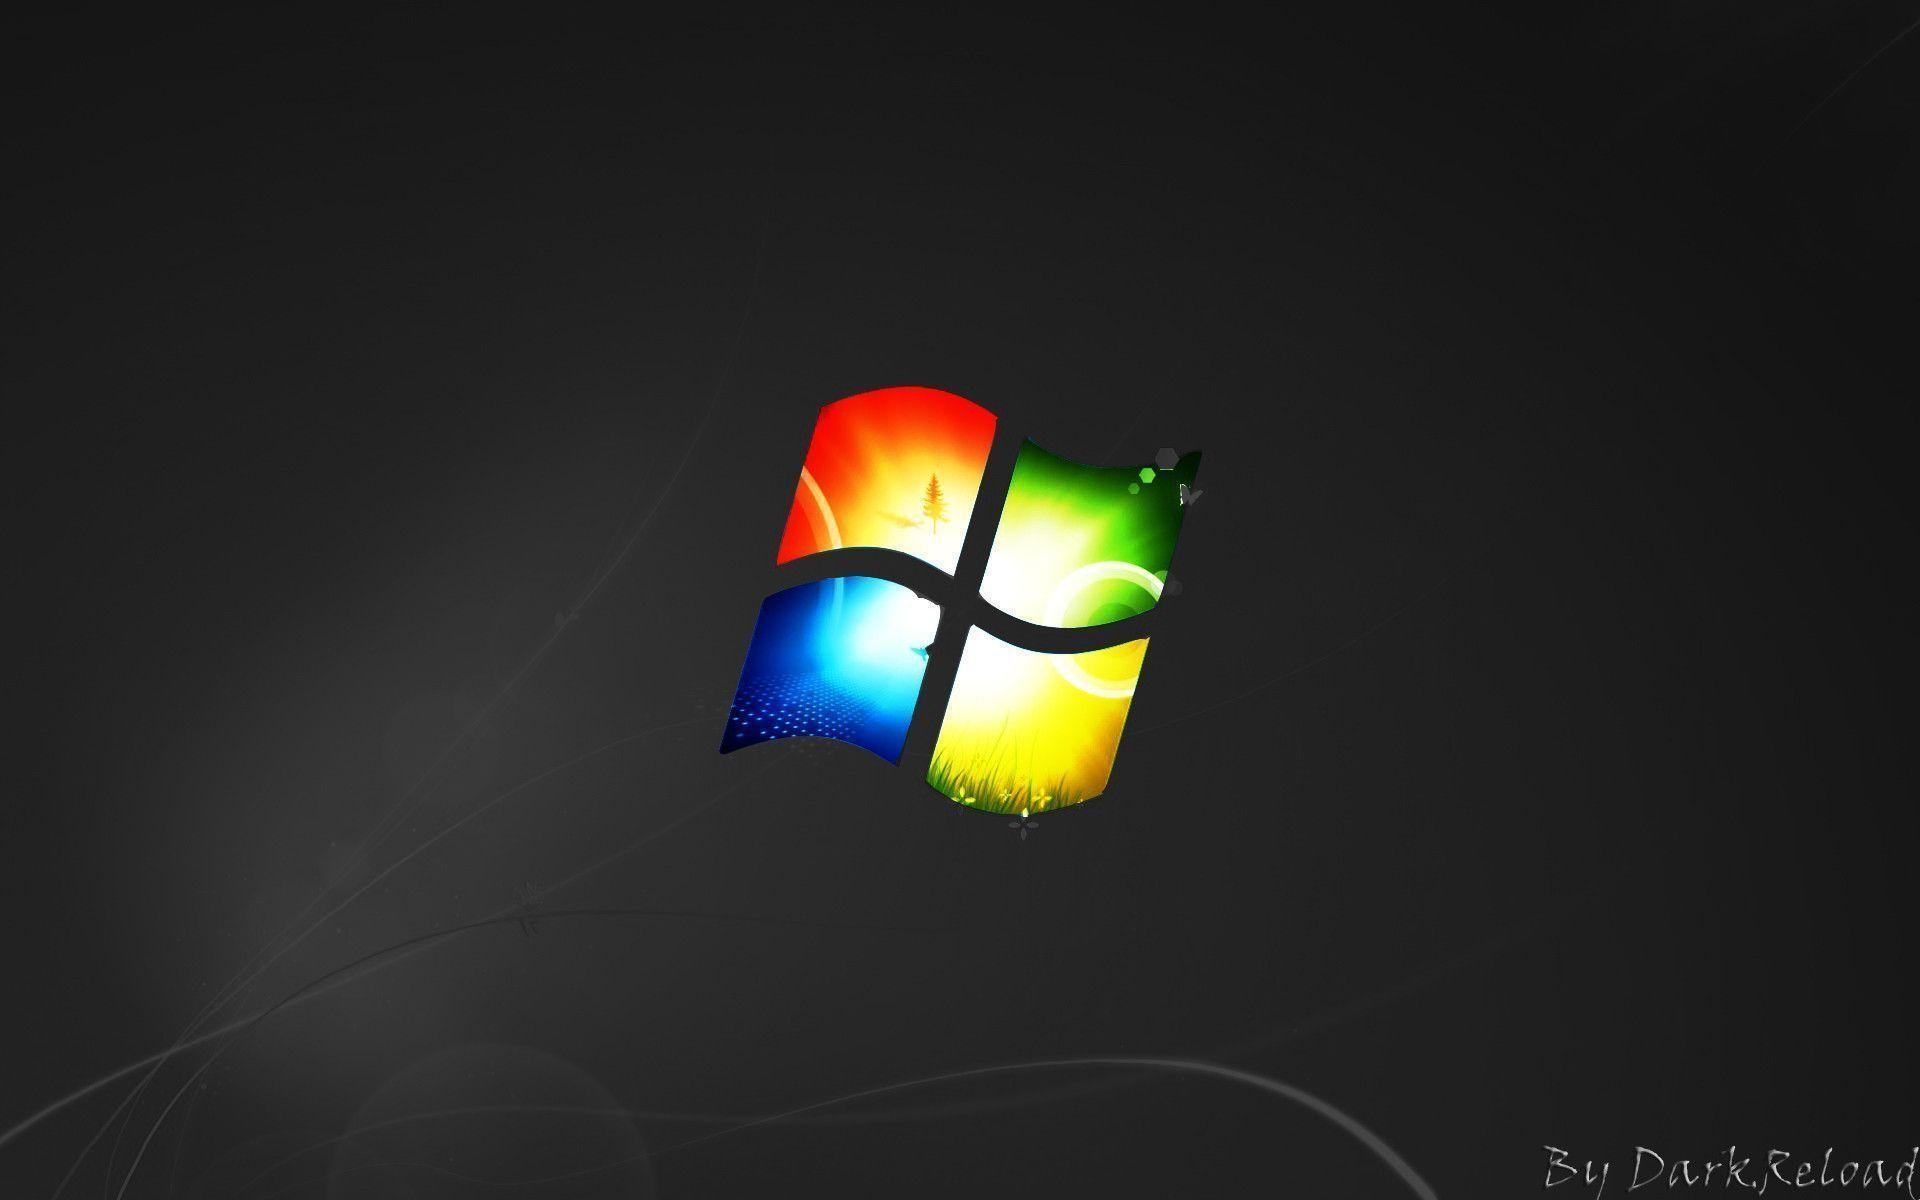 Black Windows 7 Wallpaper 76 Images